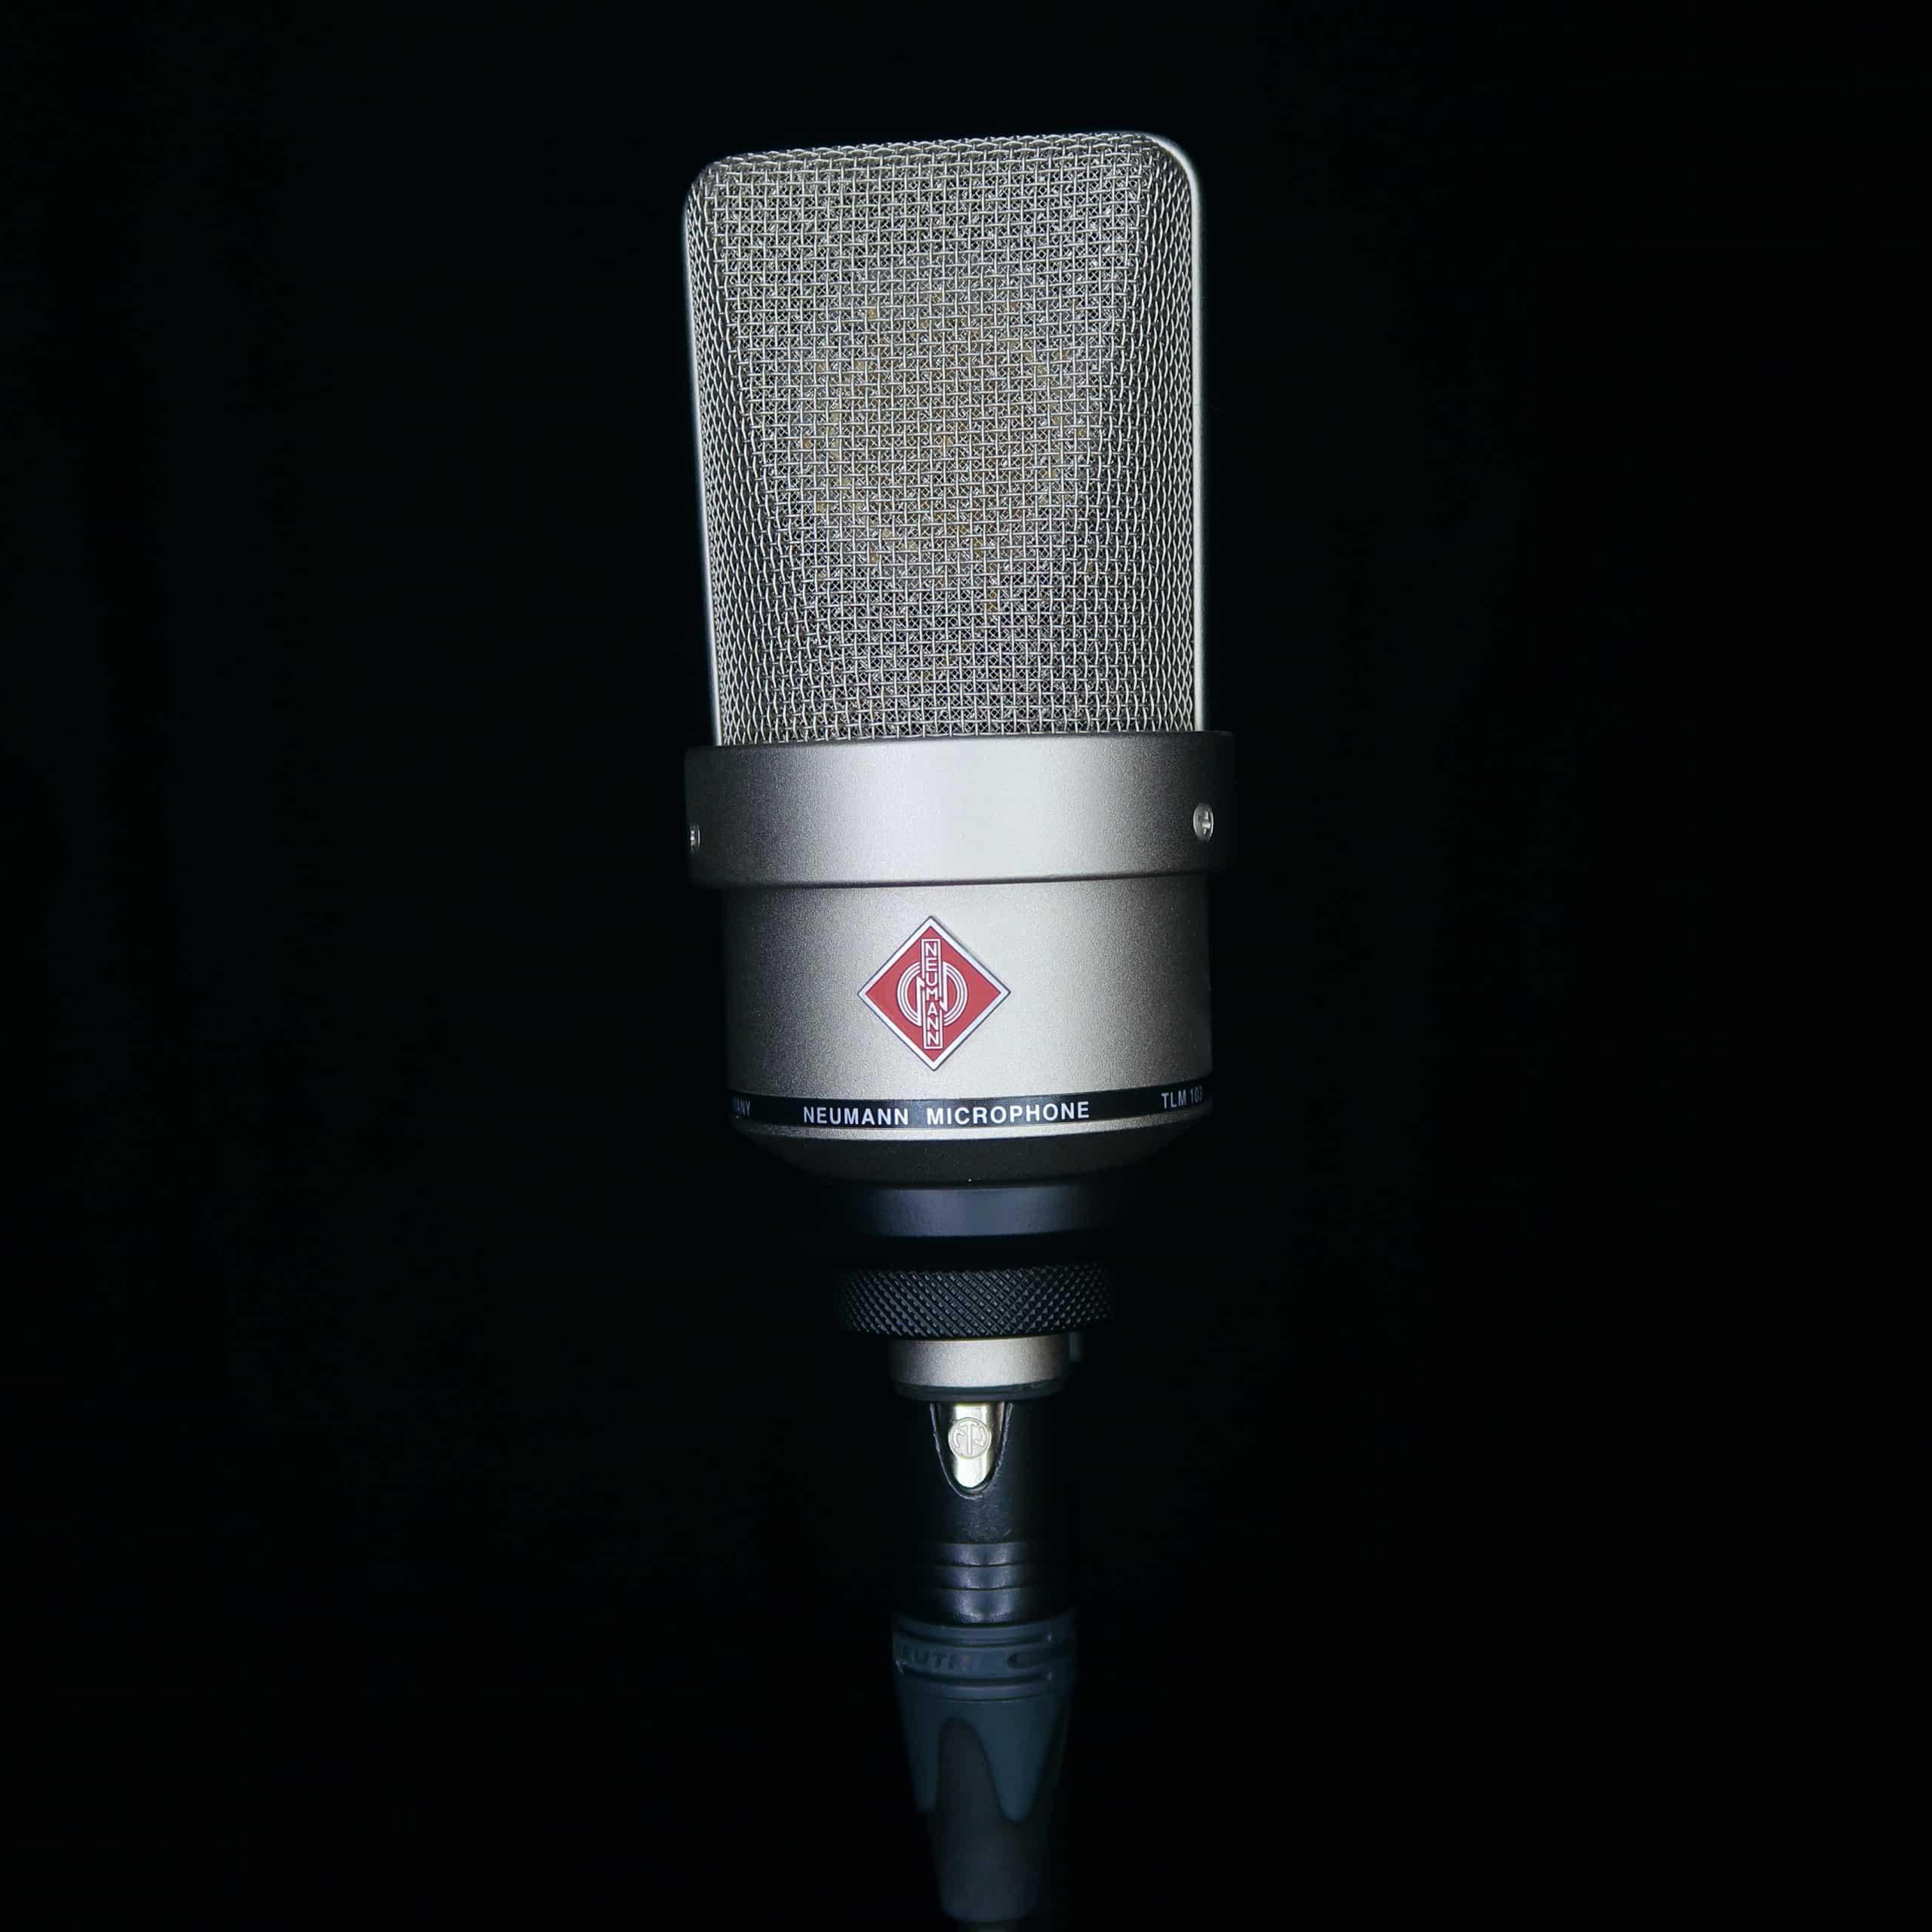 Microphone Neumann TLM 103 voix off féminine